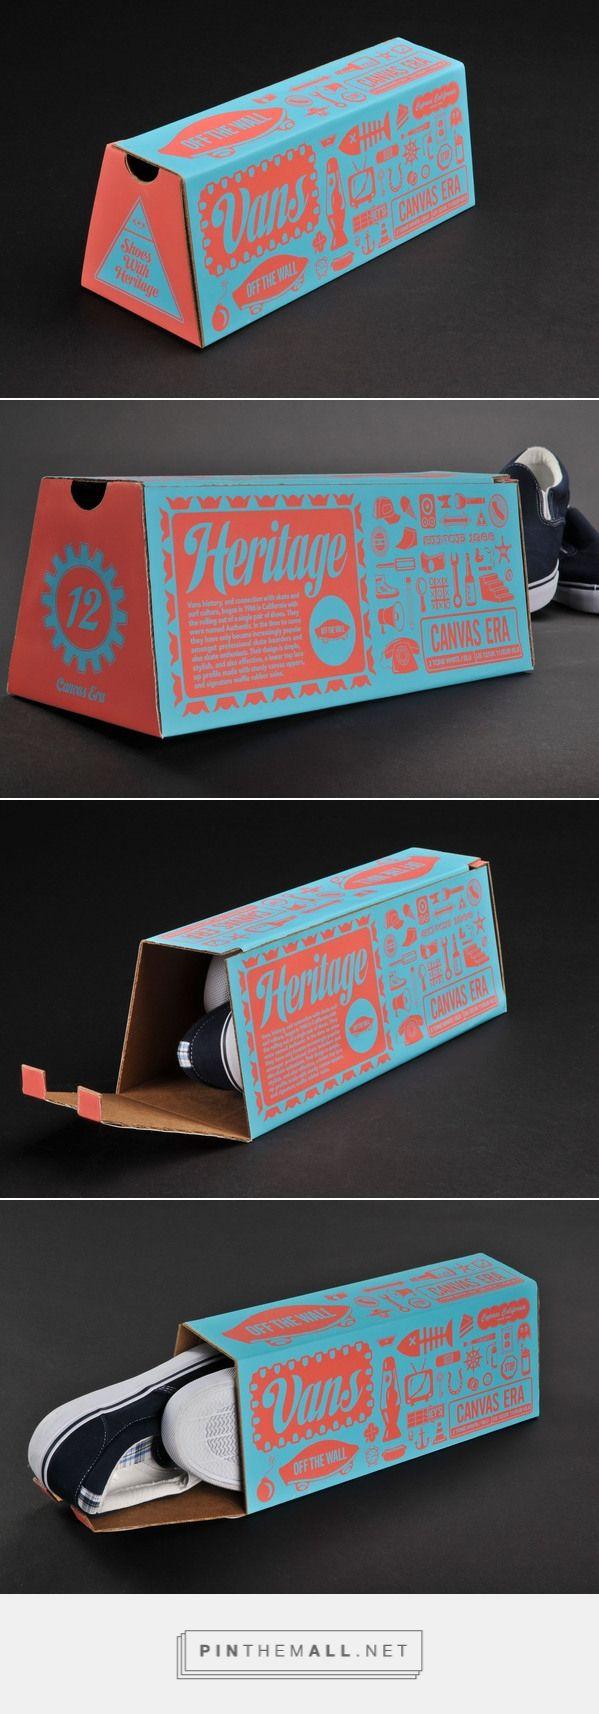 27 Beautiful Packaging Designs 11